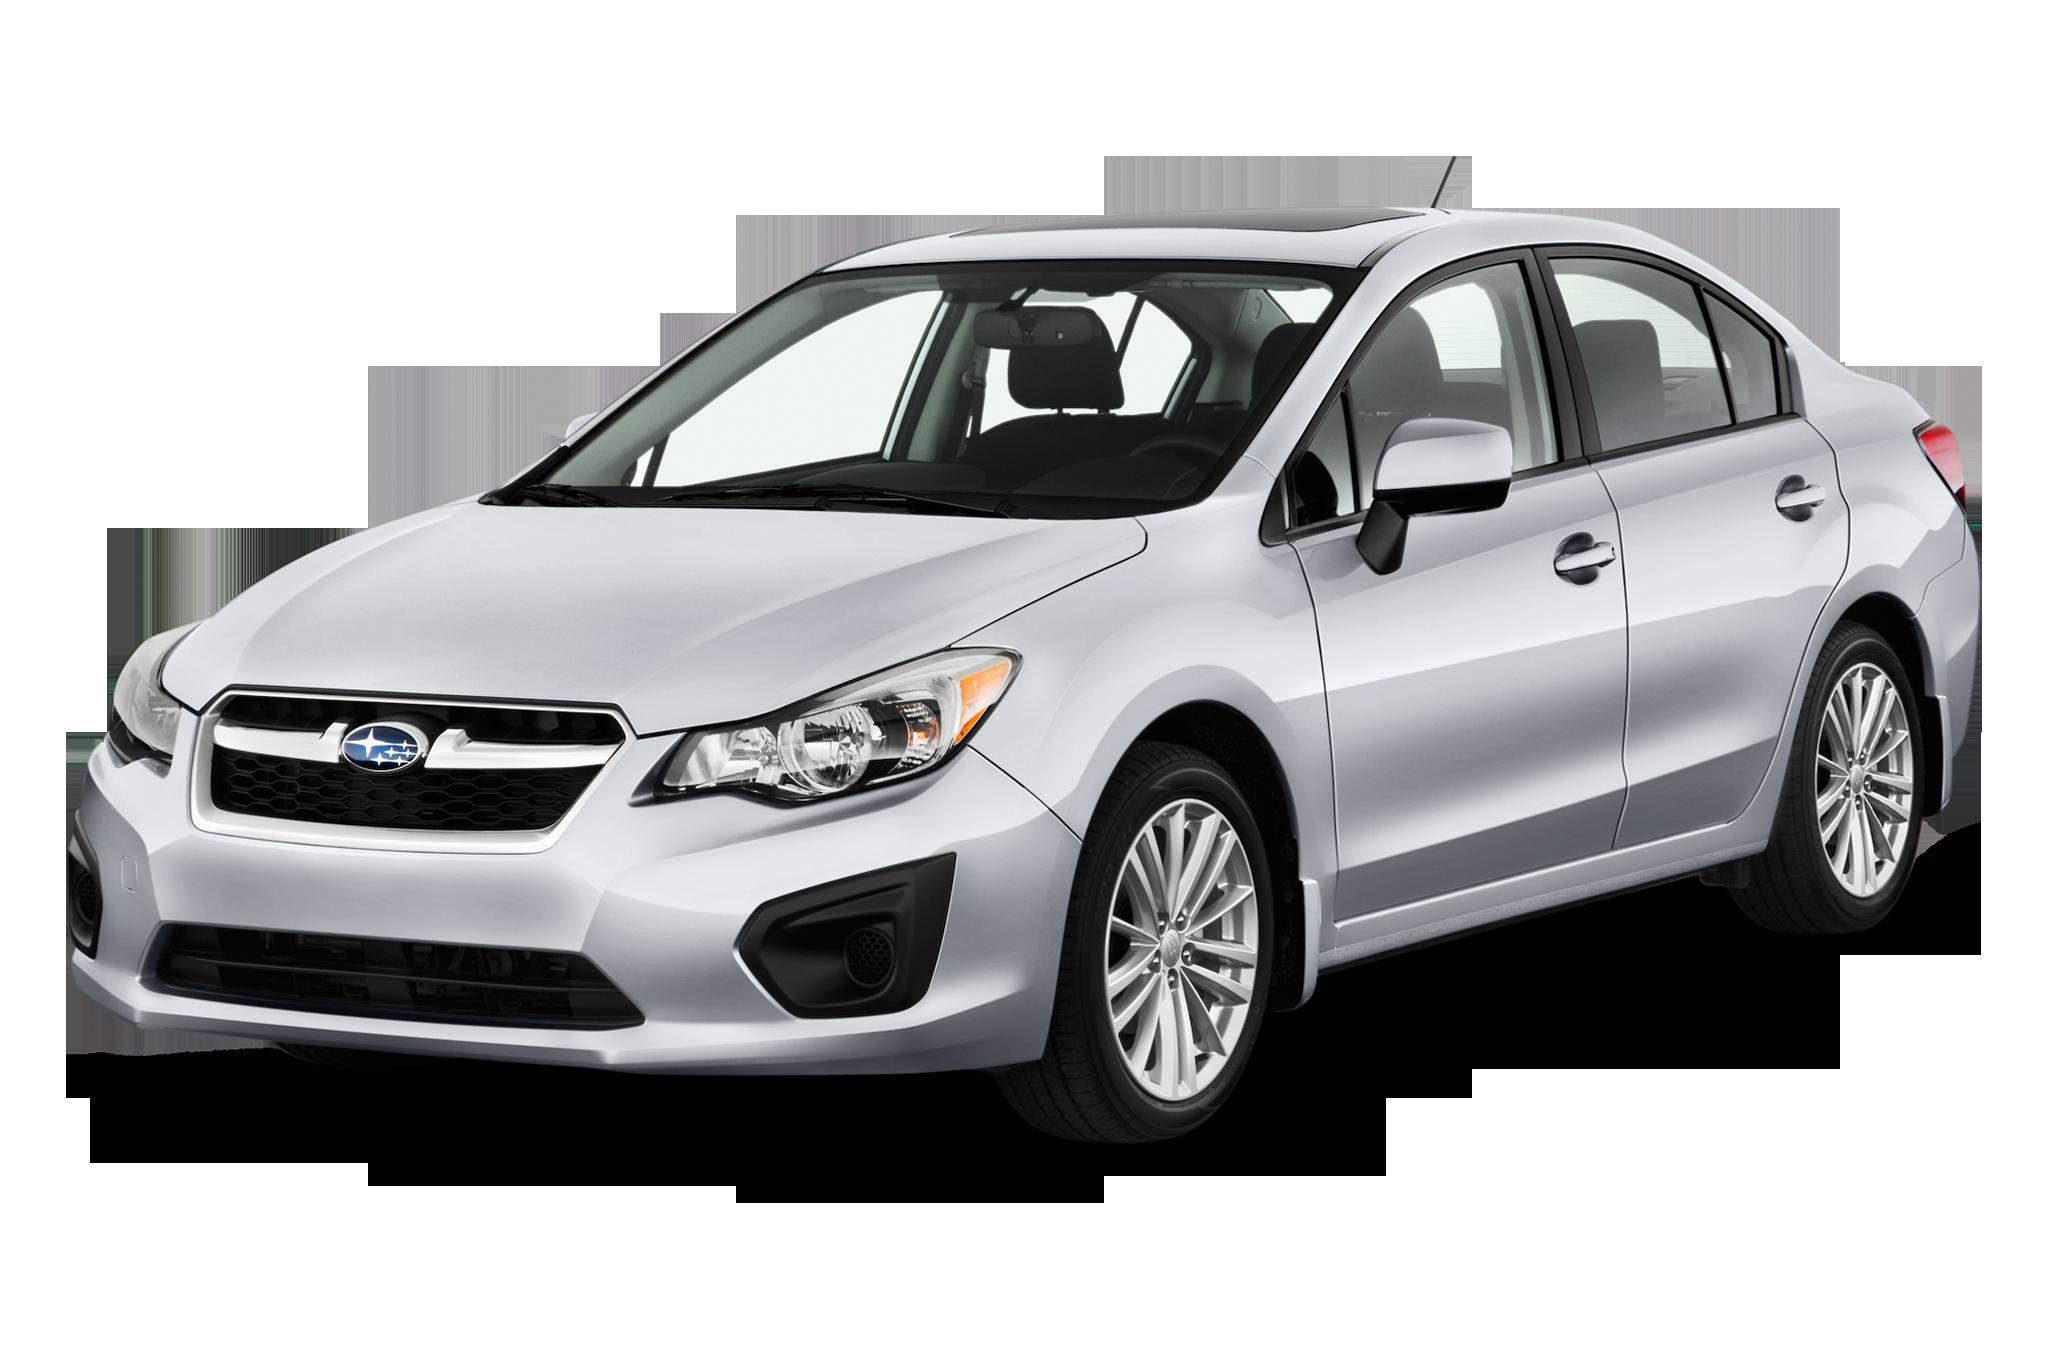 Subaru Impreza 2 0i Engine Diagrams Just Wiring 2013 Diagram Pzev Sedan Specs And Features Msn Autos 20i Hatchback